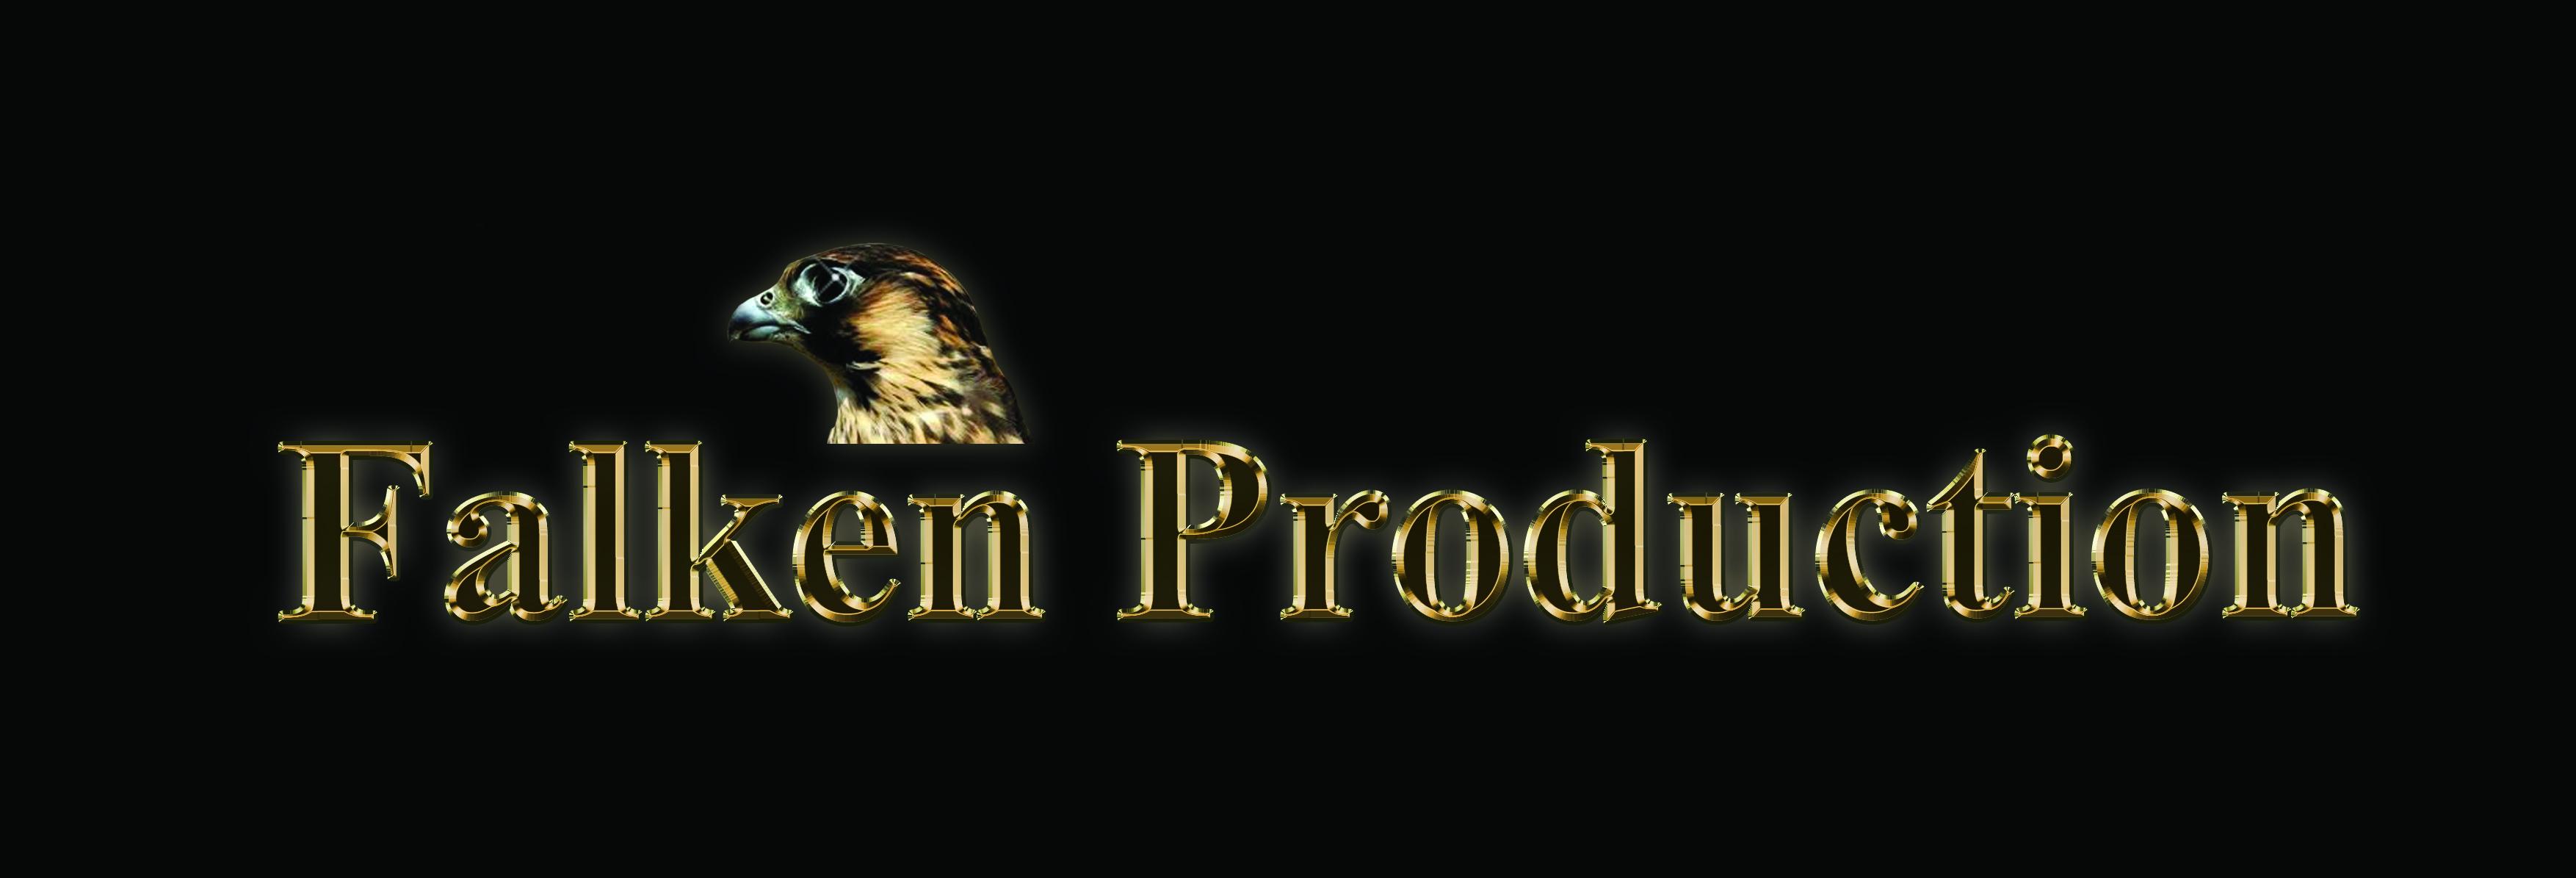 logo-falken-production